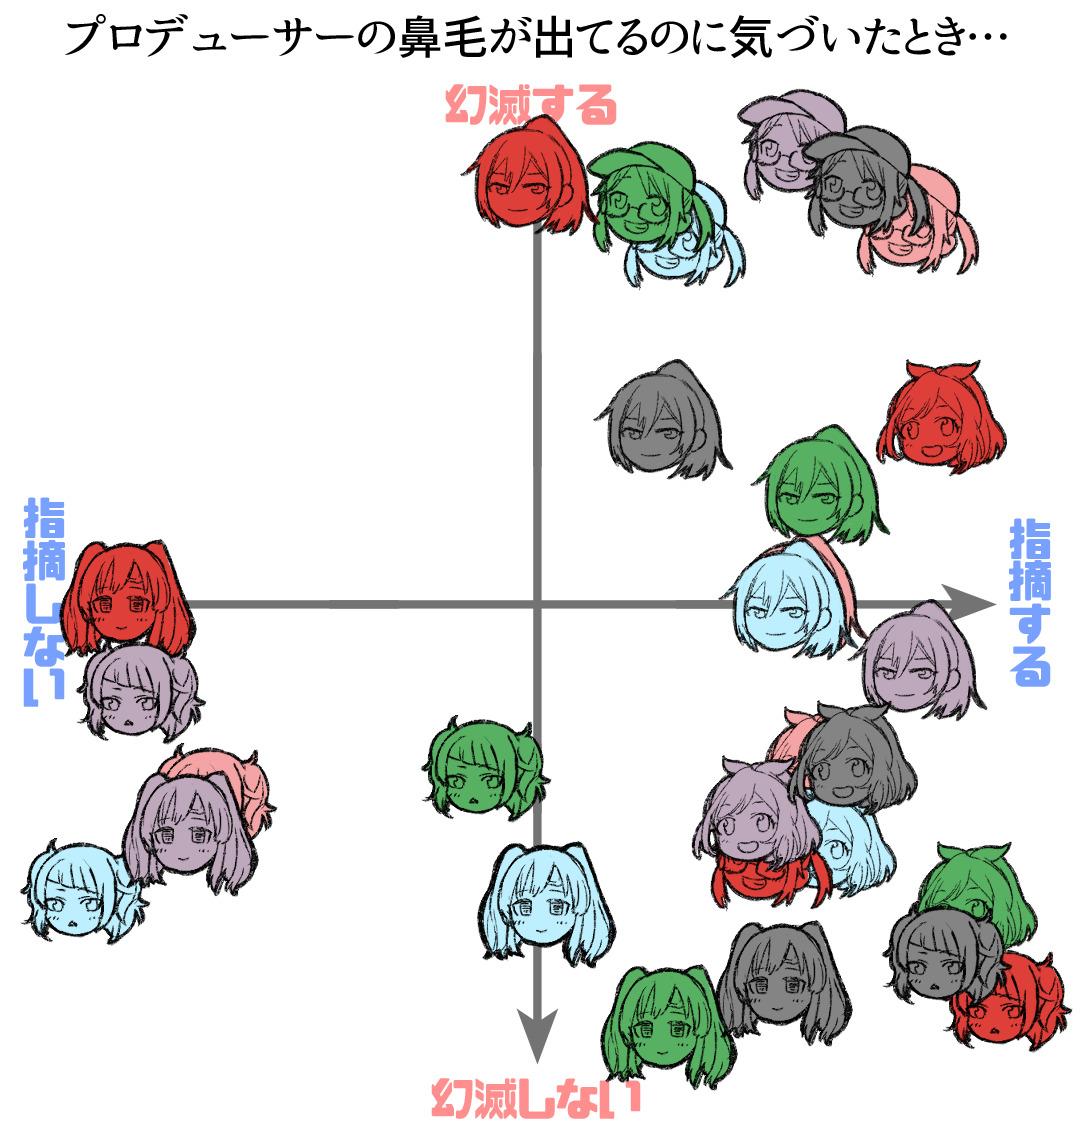 f:id:hoshi_sano:20200414113833j:image:w400